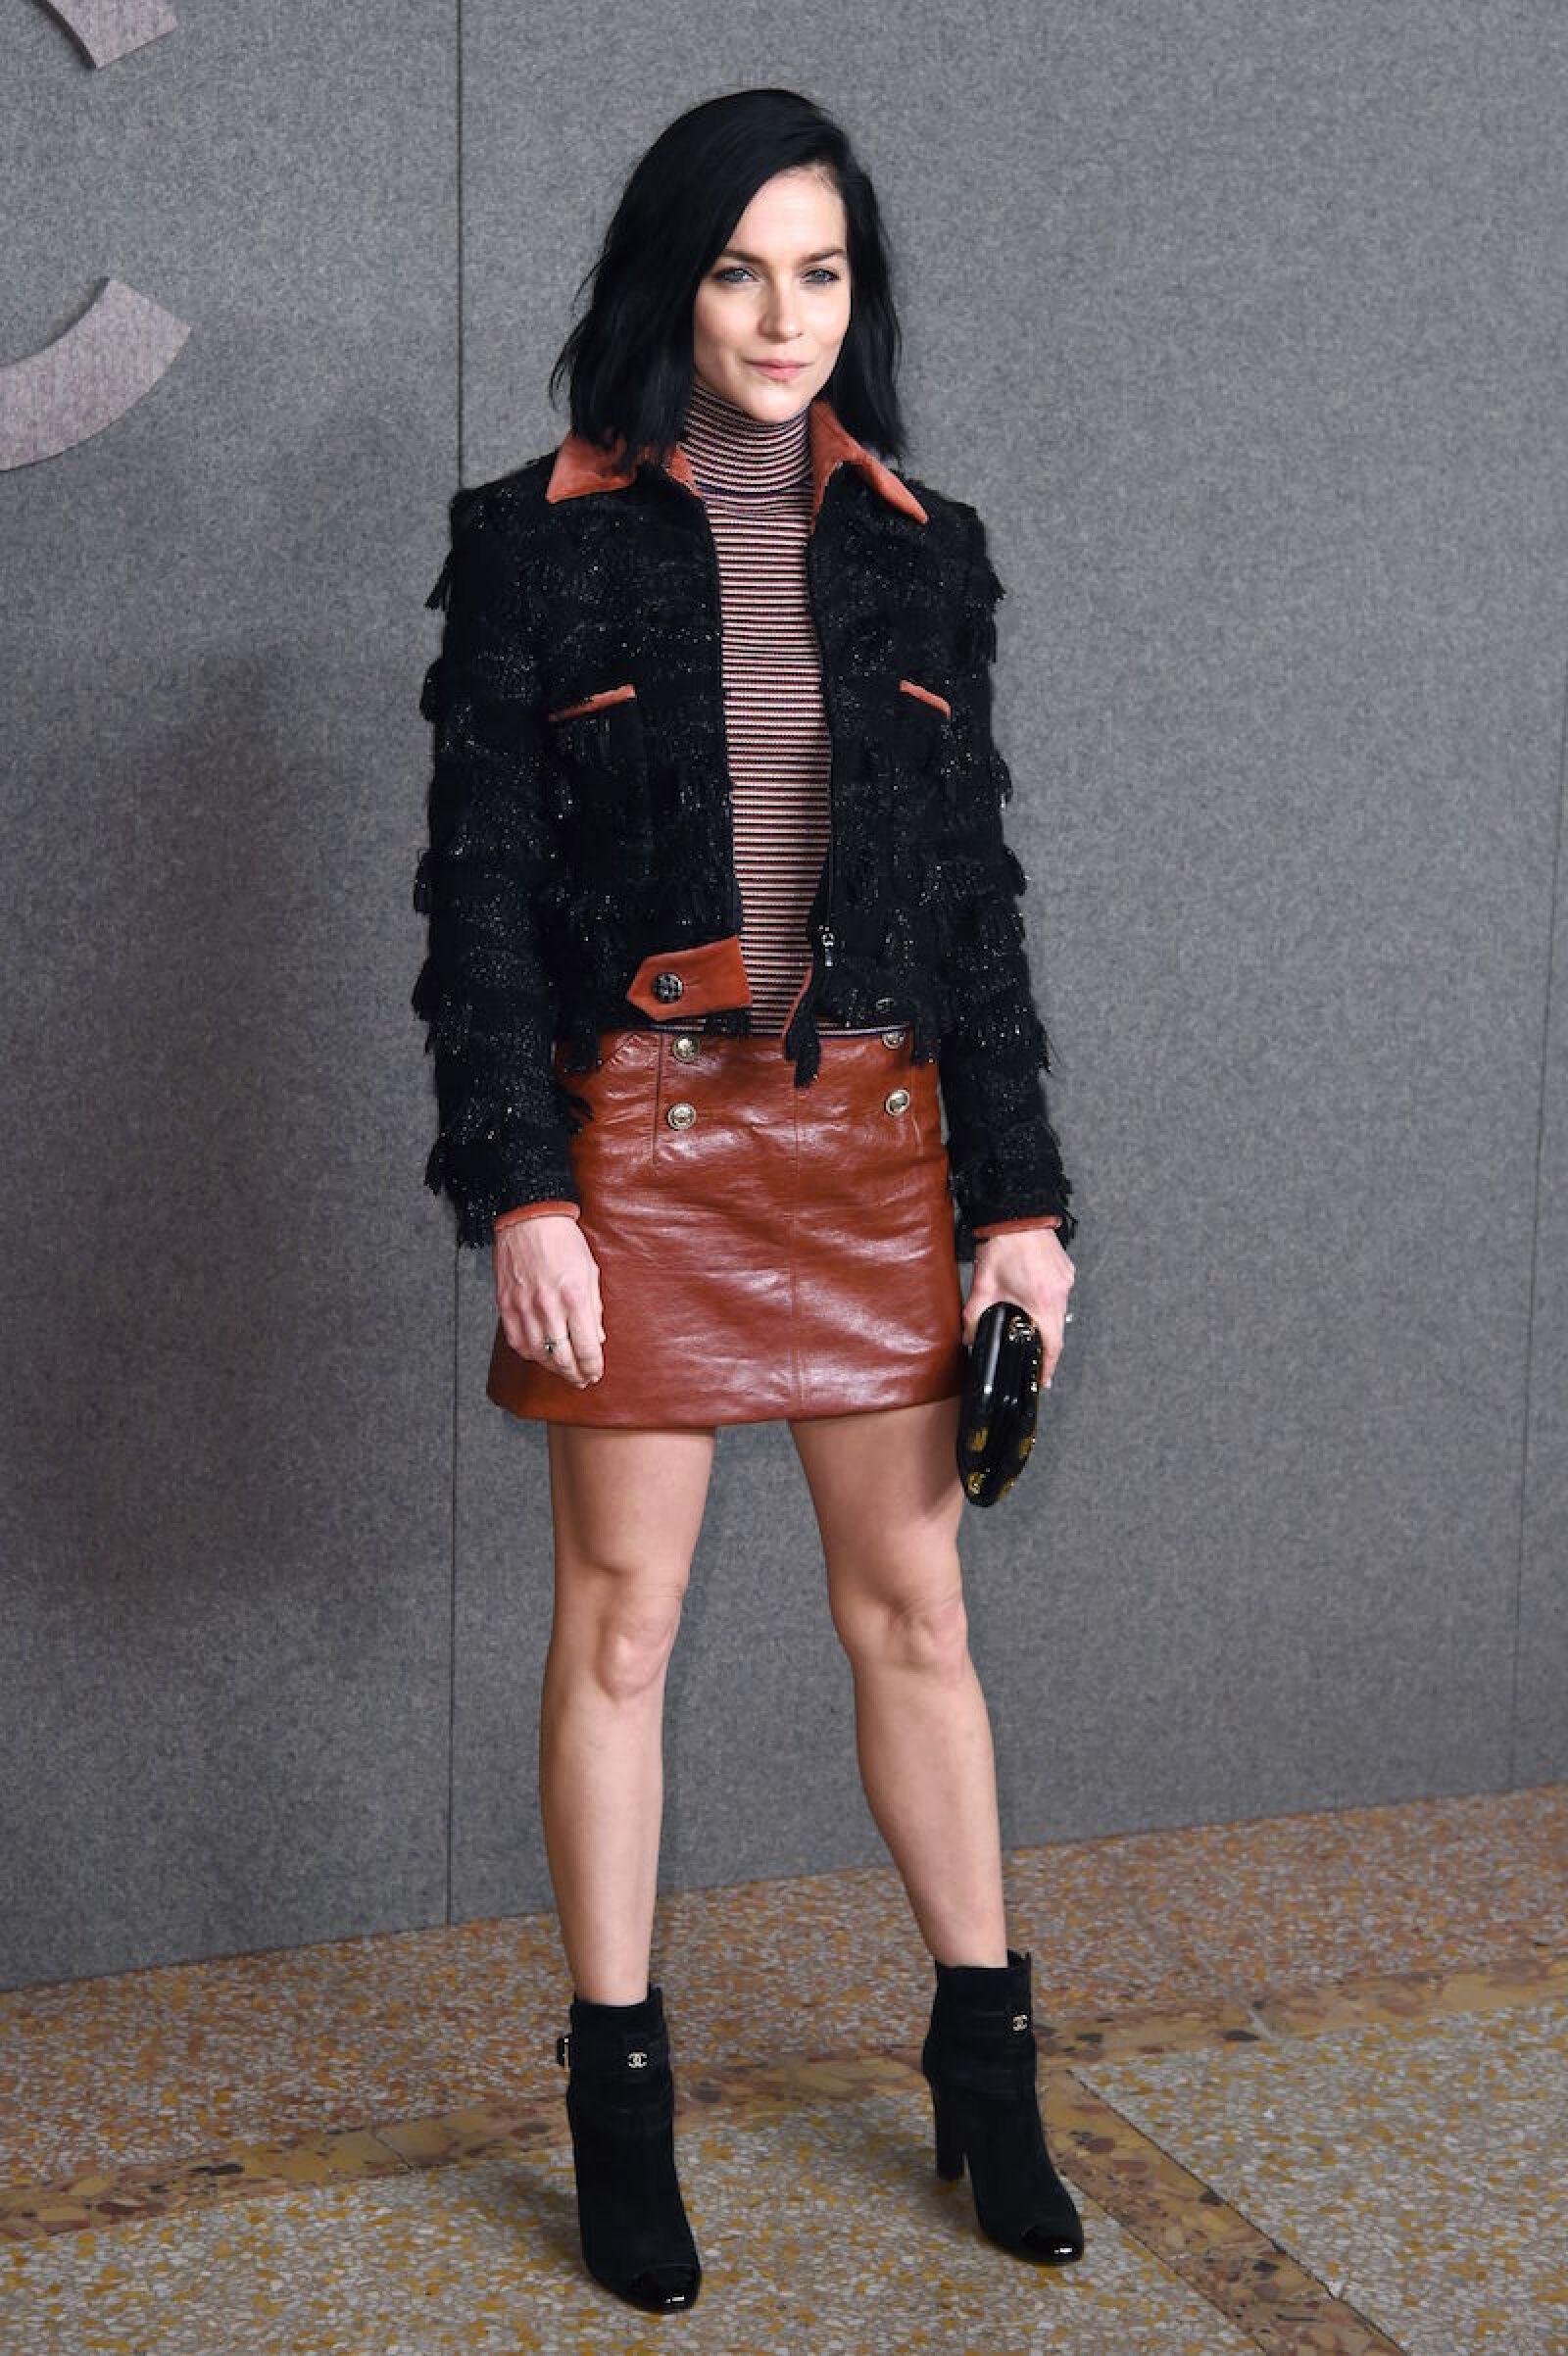 Chanel Metiers d'Art 2018-2019 show, Arrivals, New York, USA - 04 Dec 2018